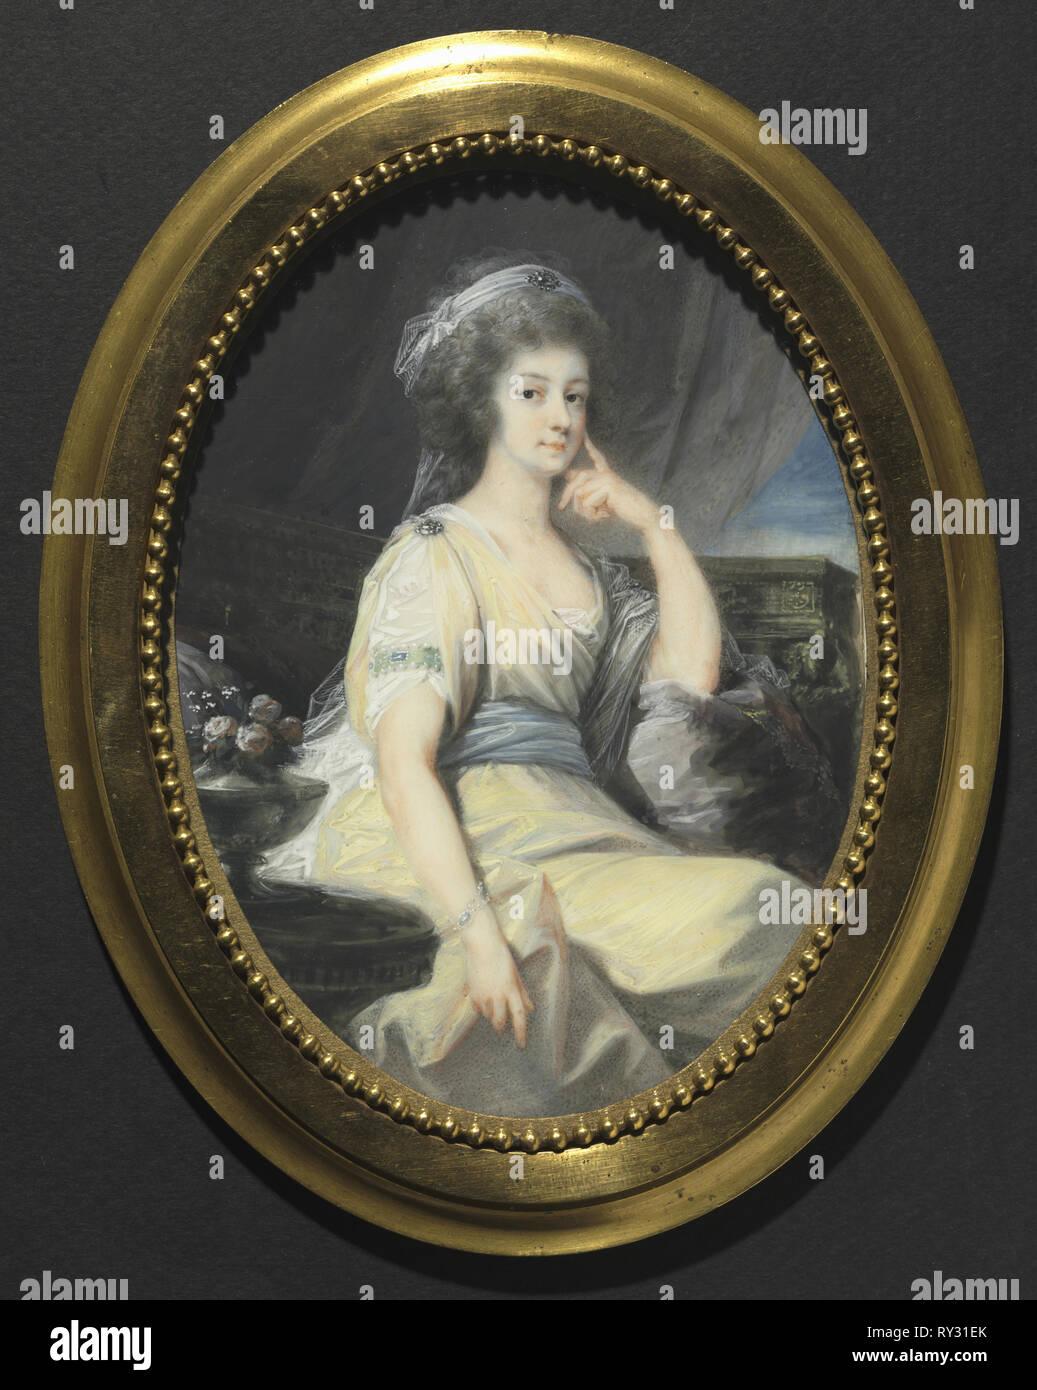 Portrait of Maria Wilhelmine, Countess Thun-Hohenstein, c. 1790. Heinrich Friedrich Füger (German, 1751-1818). Watercolor on ivory in an ormolu frame; framed: 22.4 x 17.5 cm (8 13/16 x 6 7/8 in.); unframed: 17.5 x 12.7 cm (6 7/8 x 5 in Stock Photo